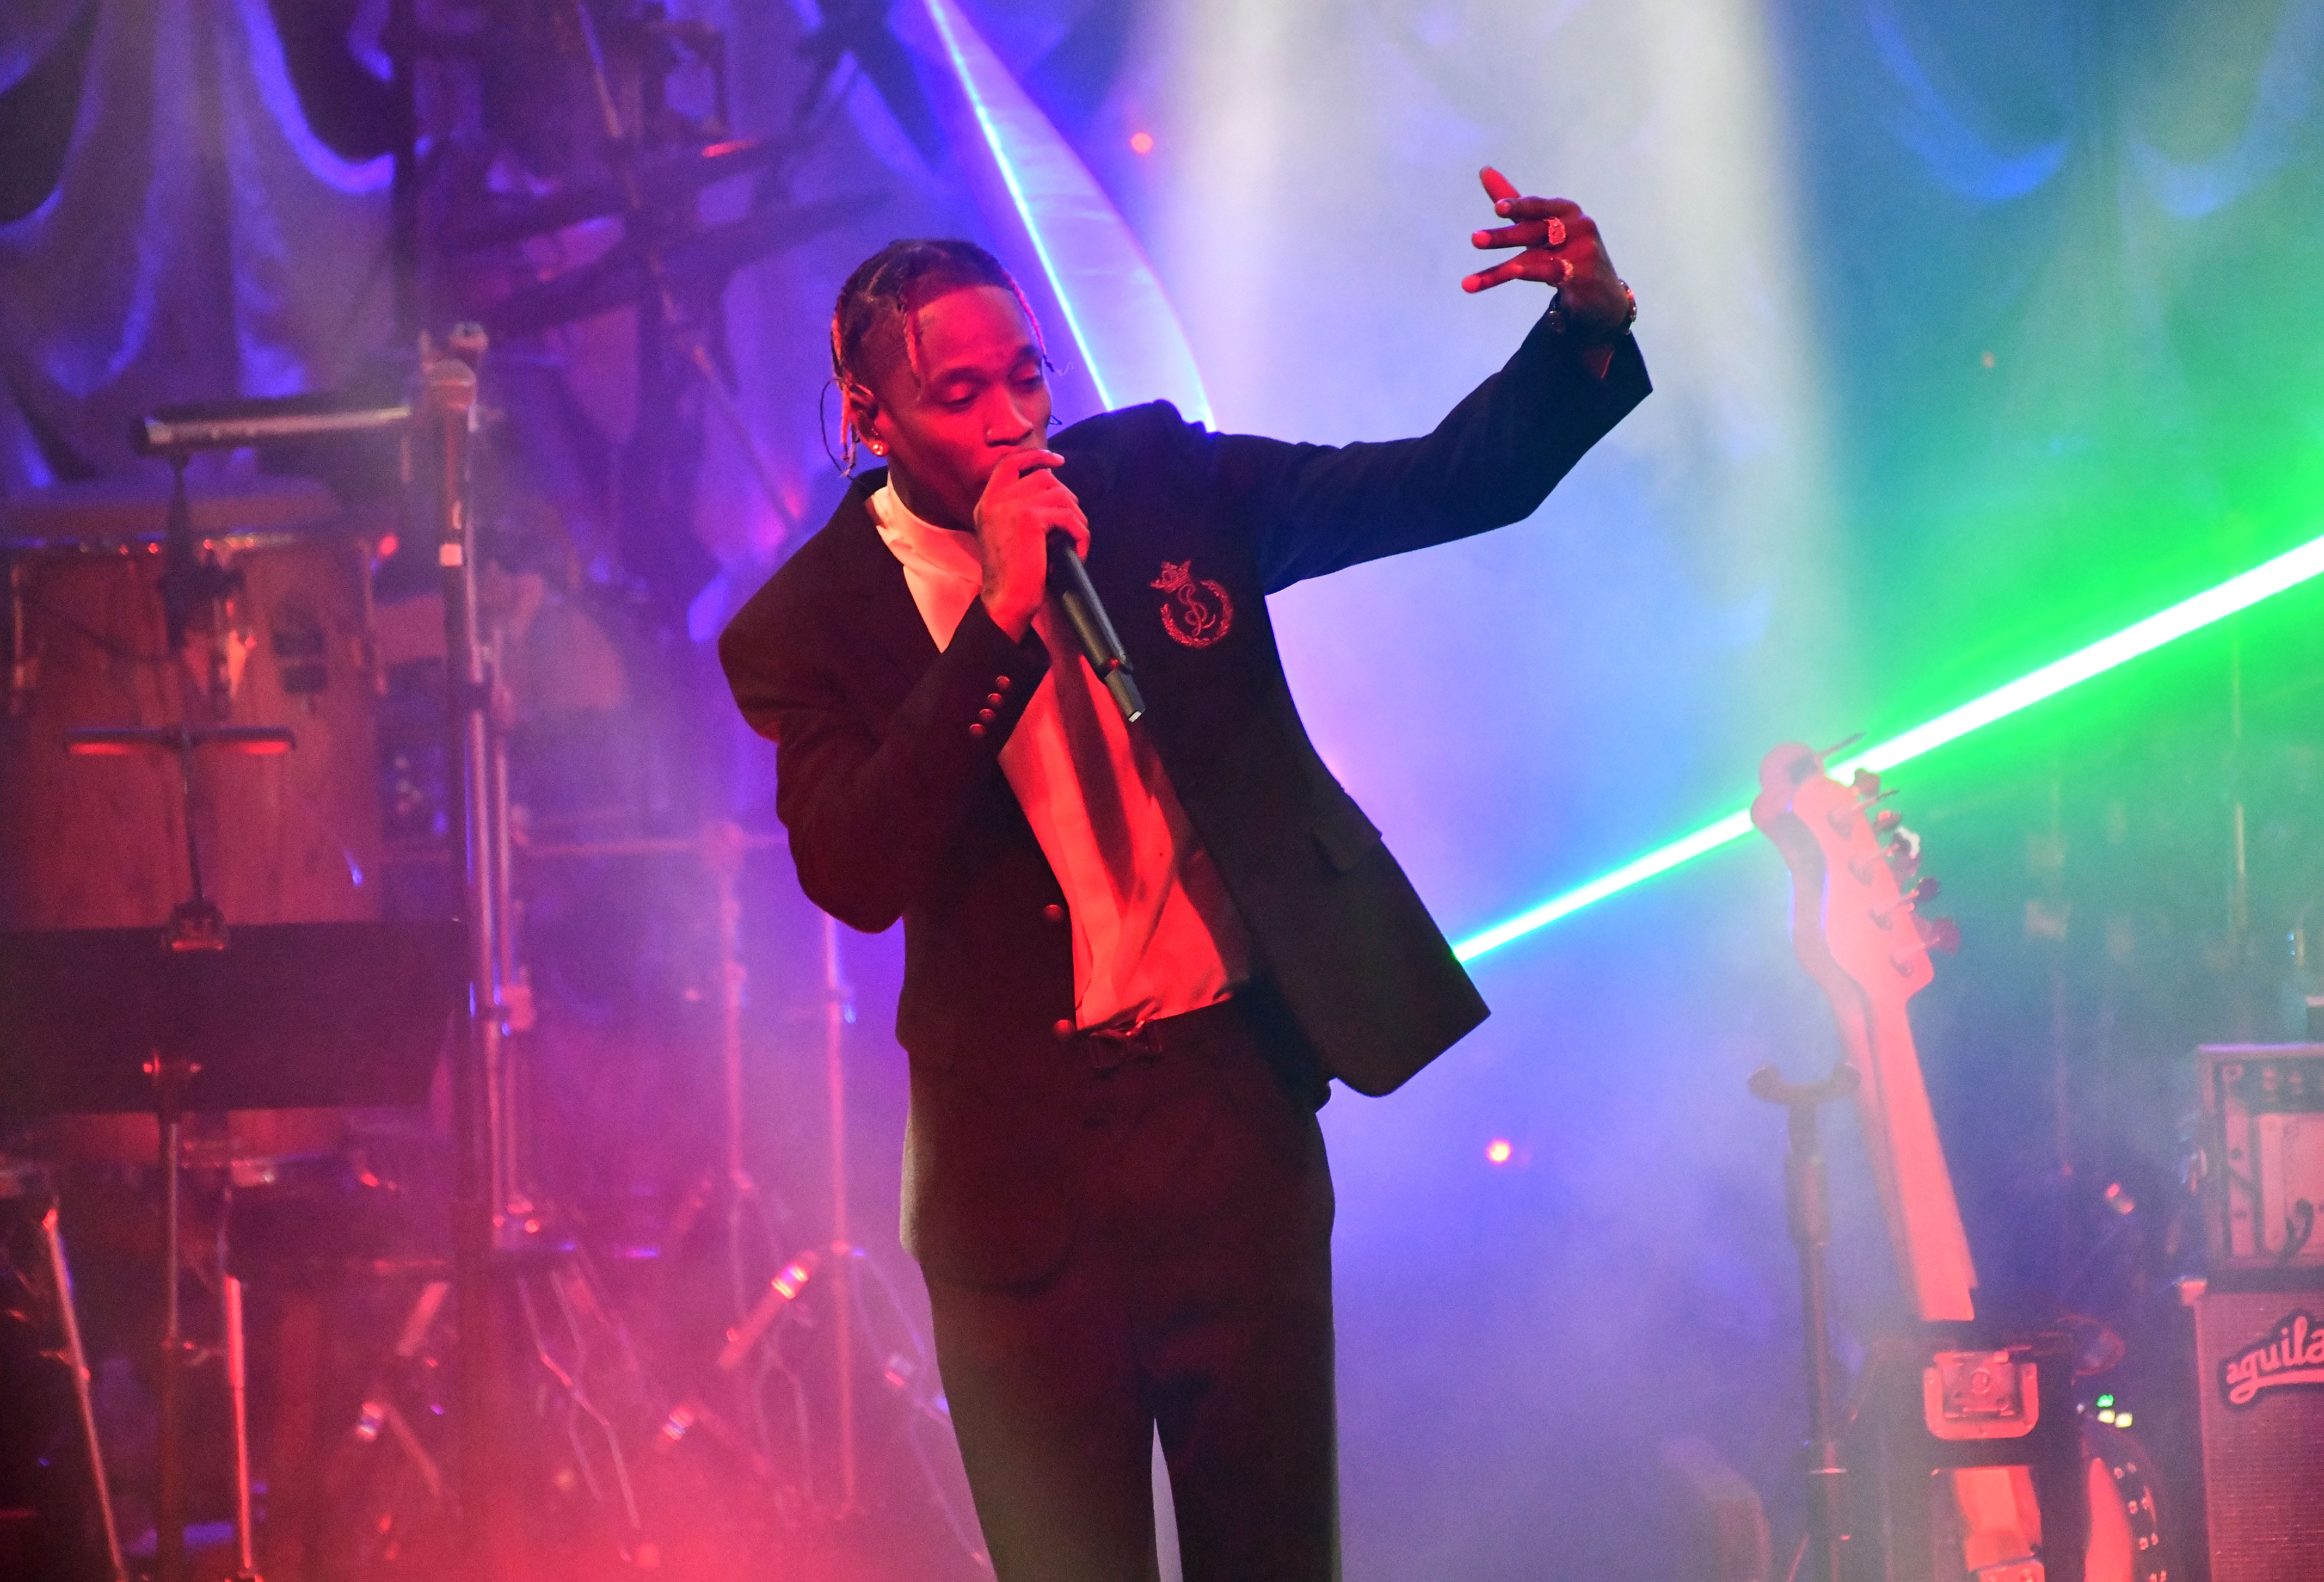 Clive Davis' pre-Grammys gala 2019: 5 biggest moments from Travis Scott to Nancy Pelosi